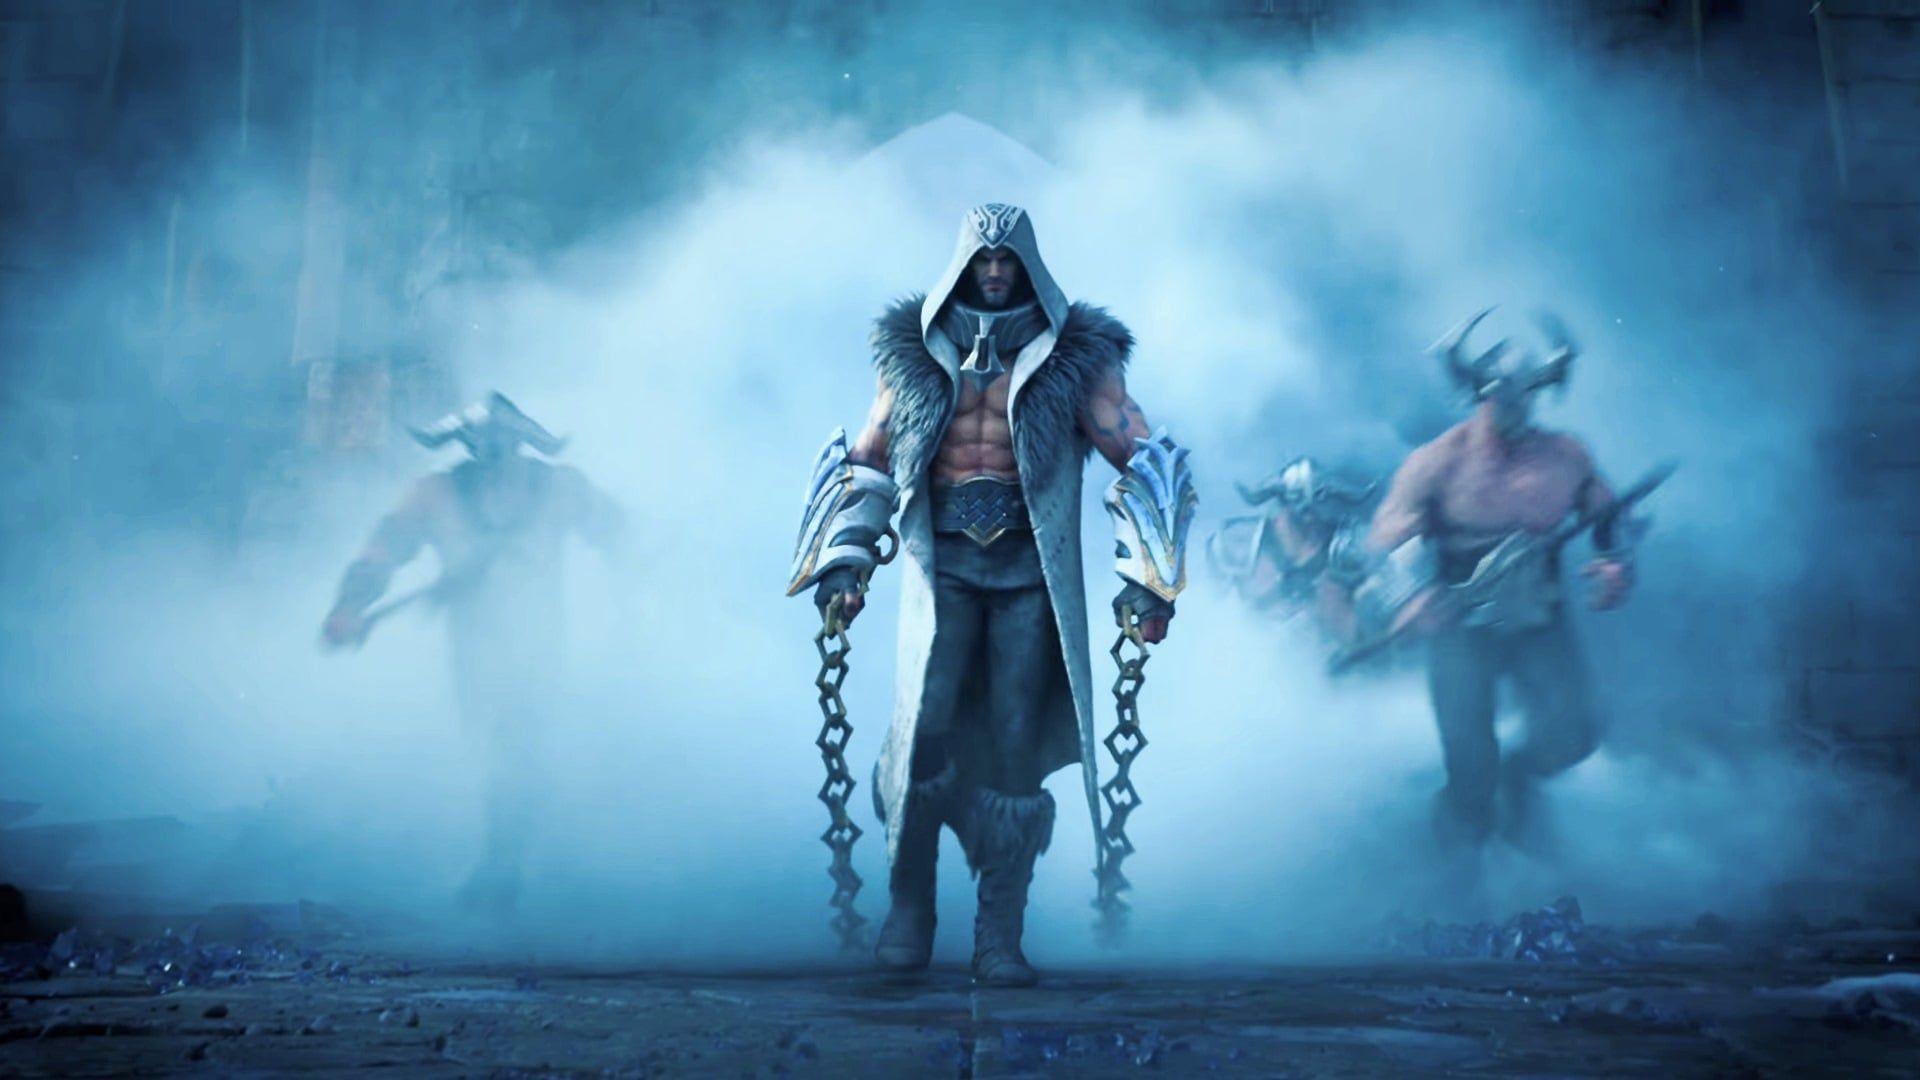 League Of Legends 2020 Warriors Cinematic Wallpapers in